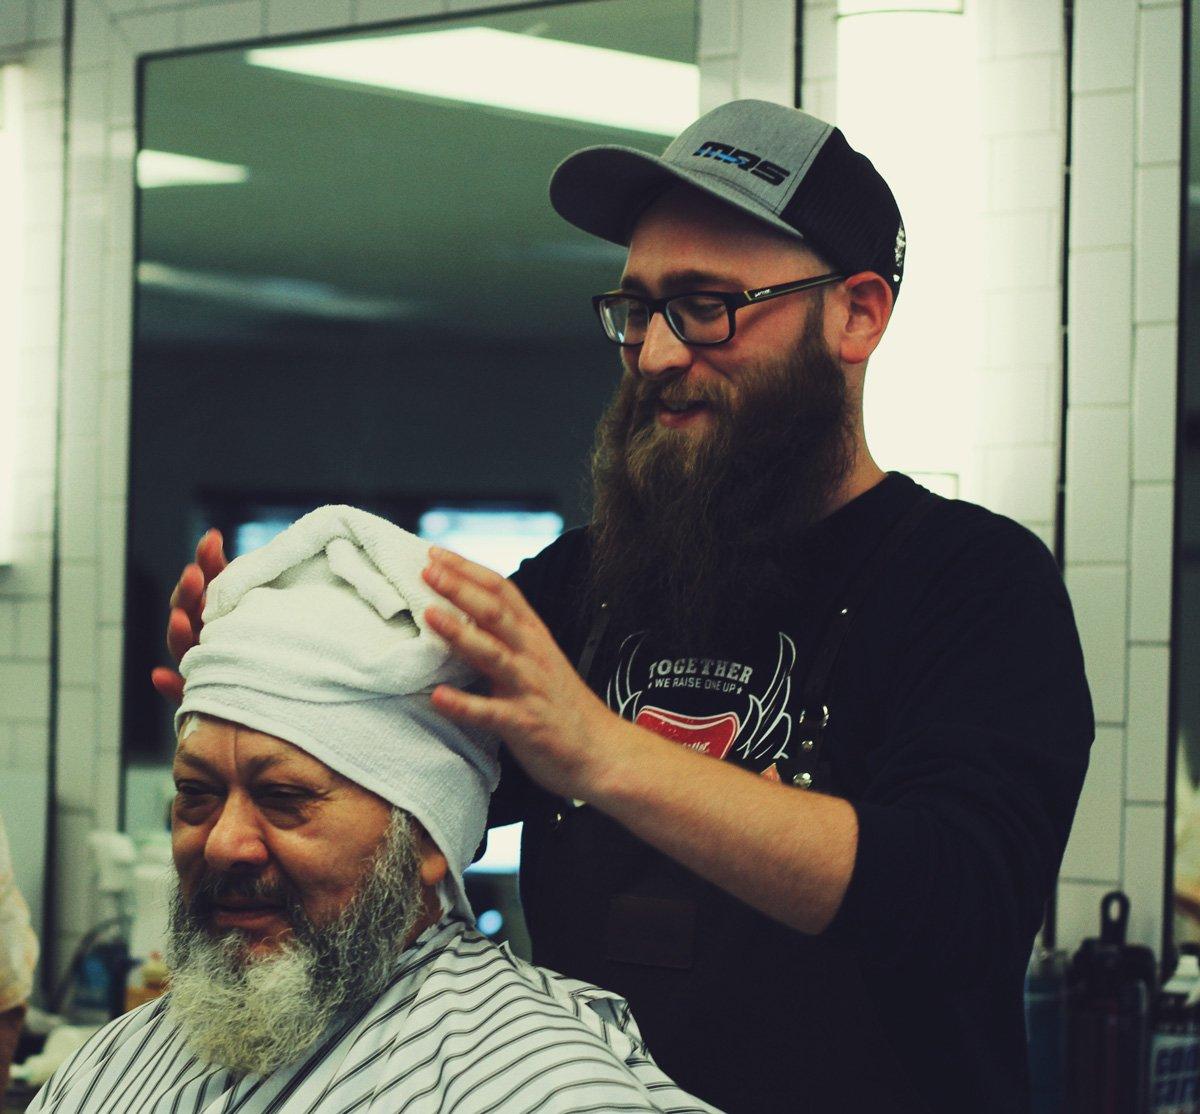 gent's classic barbershop menomonee falls wisconsin will beard trim hot towel